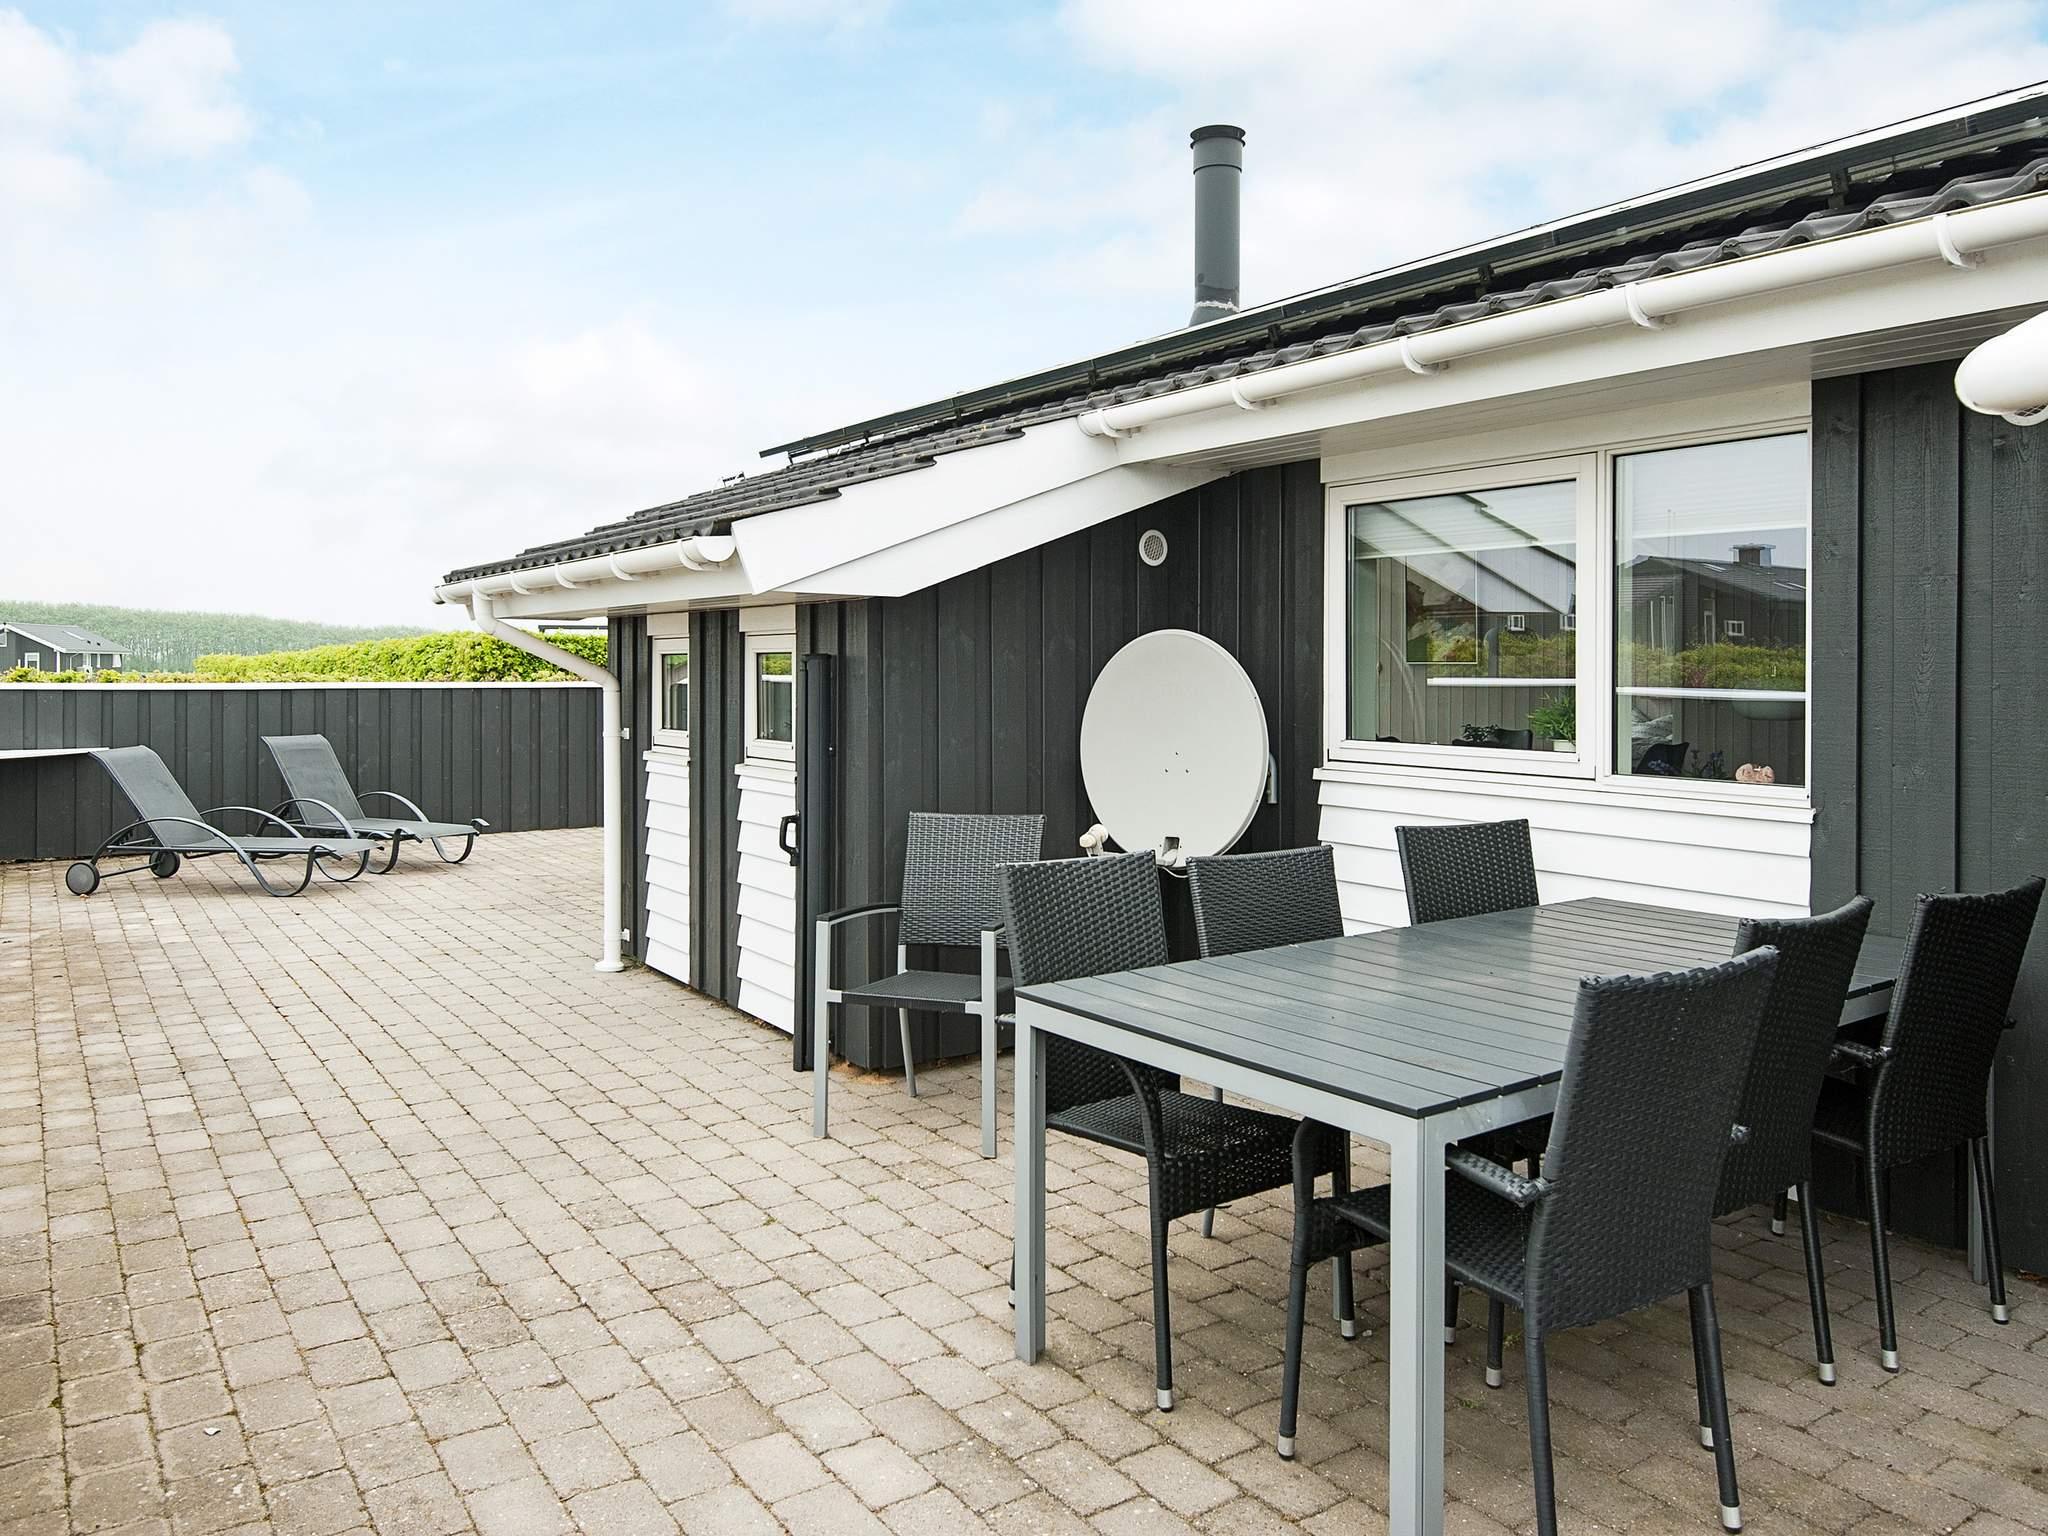 Ferienhaus Flovt Strand (379532), Flovt Strand, , Südostjütland, Dänemark, Bild 32